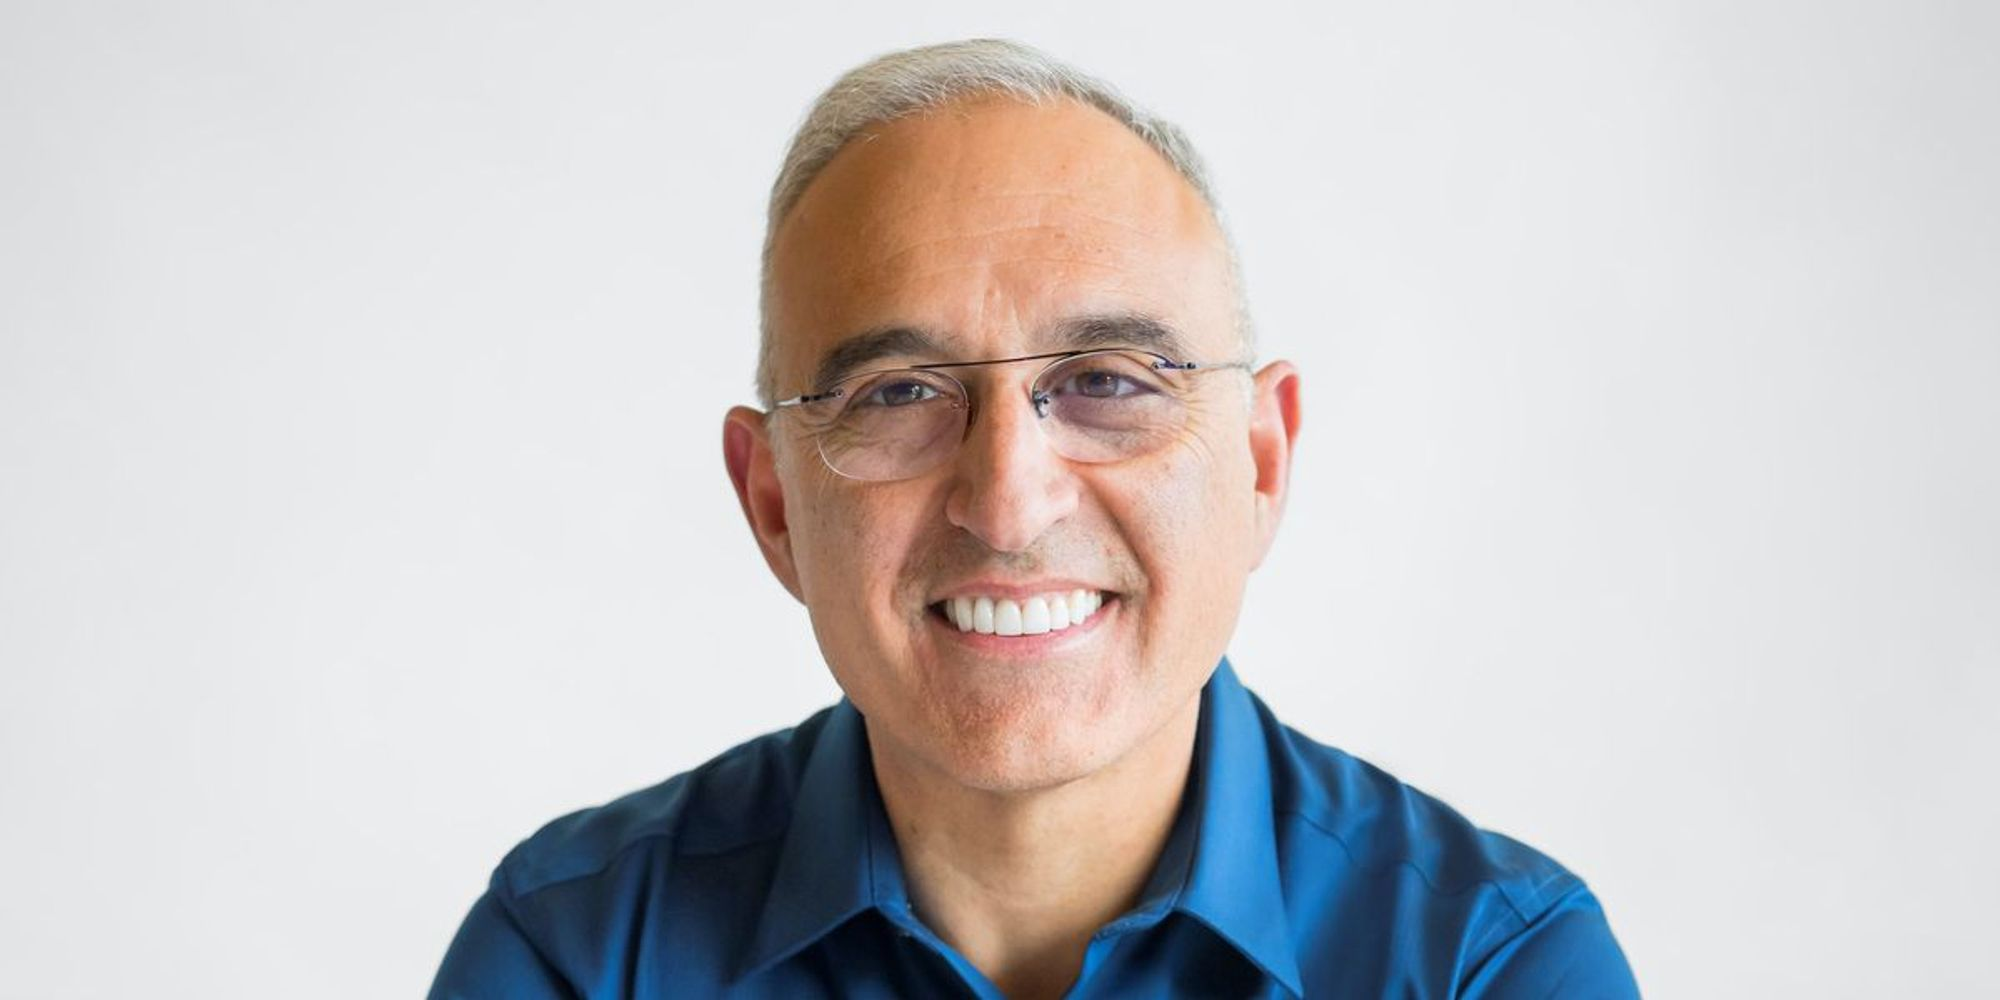 HPE's CEO Antonio Neri: Why cloud computing is like the Hotel California